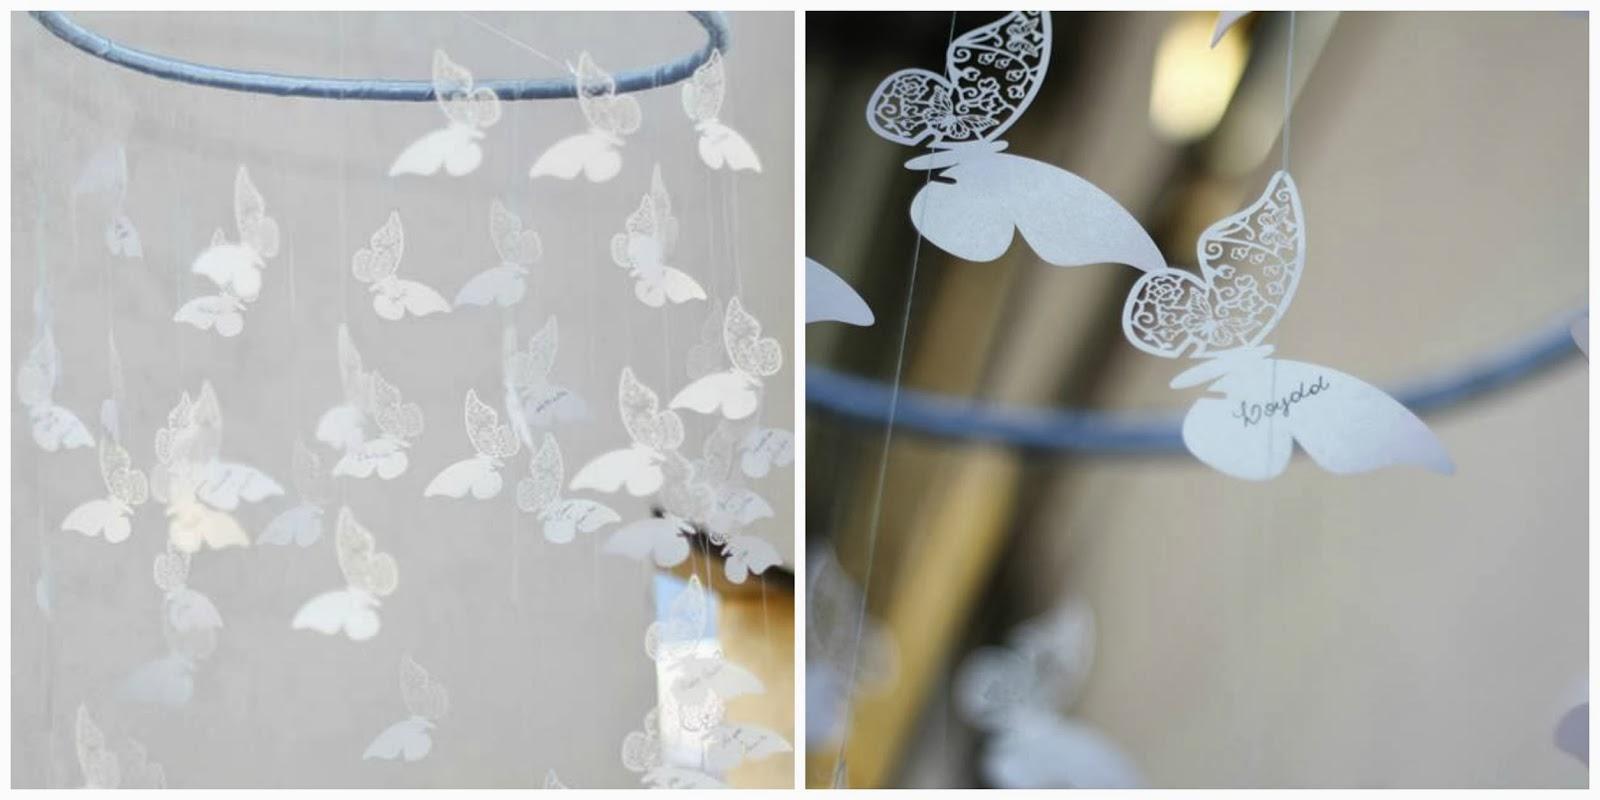 cha-tarde-tema-alice-pais-maravilhas-borboletas